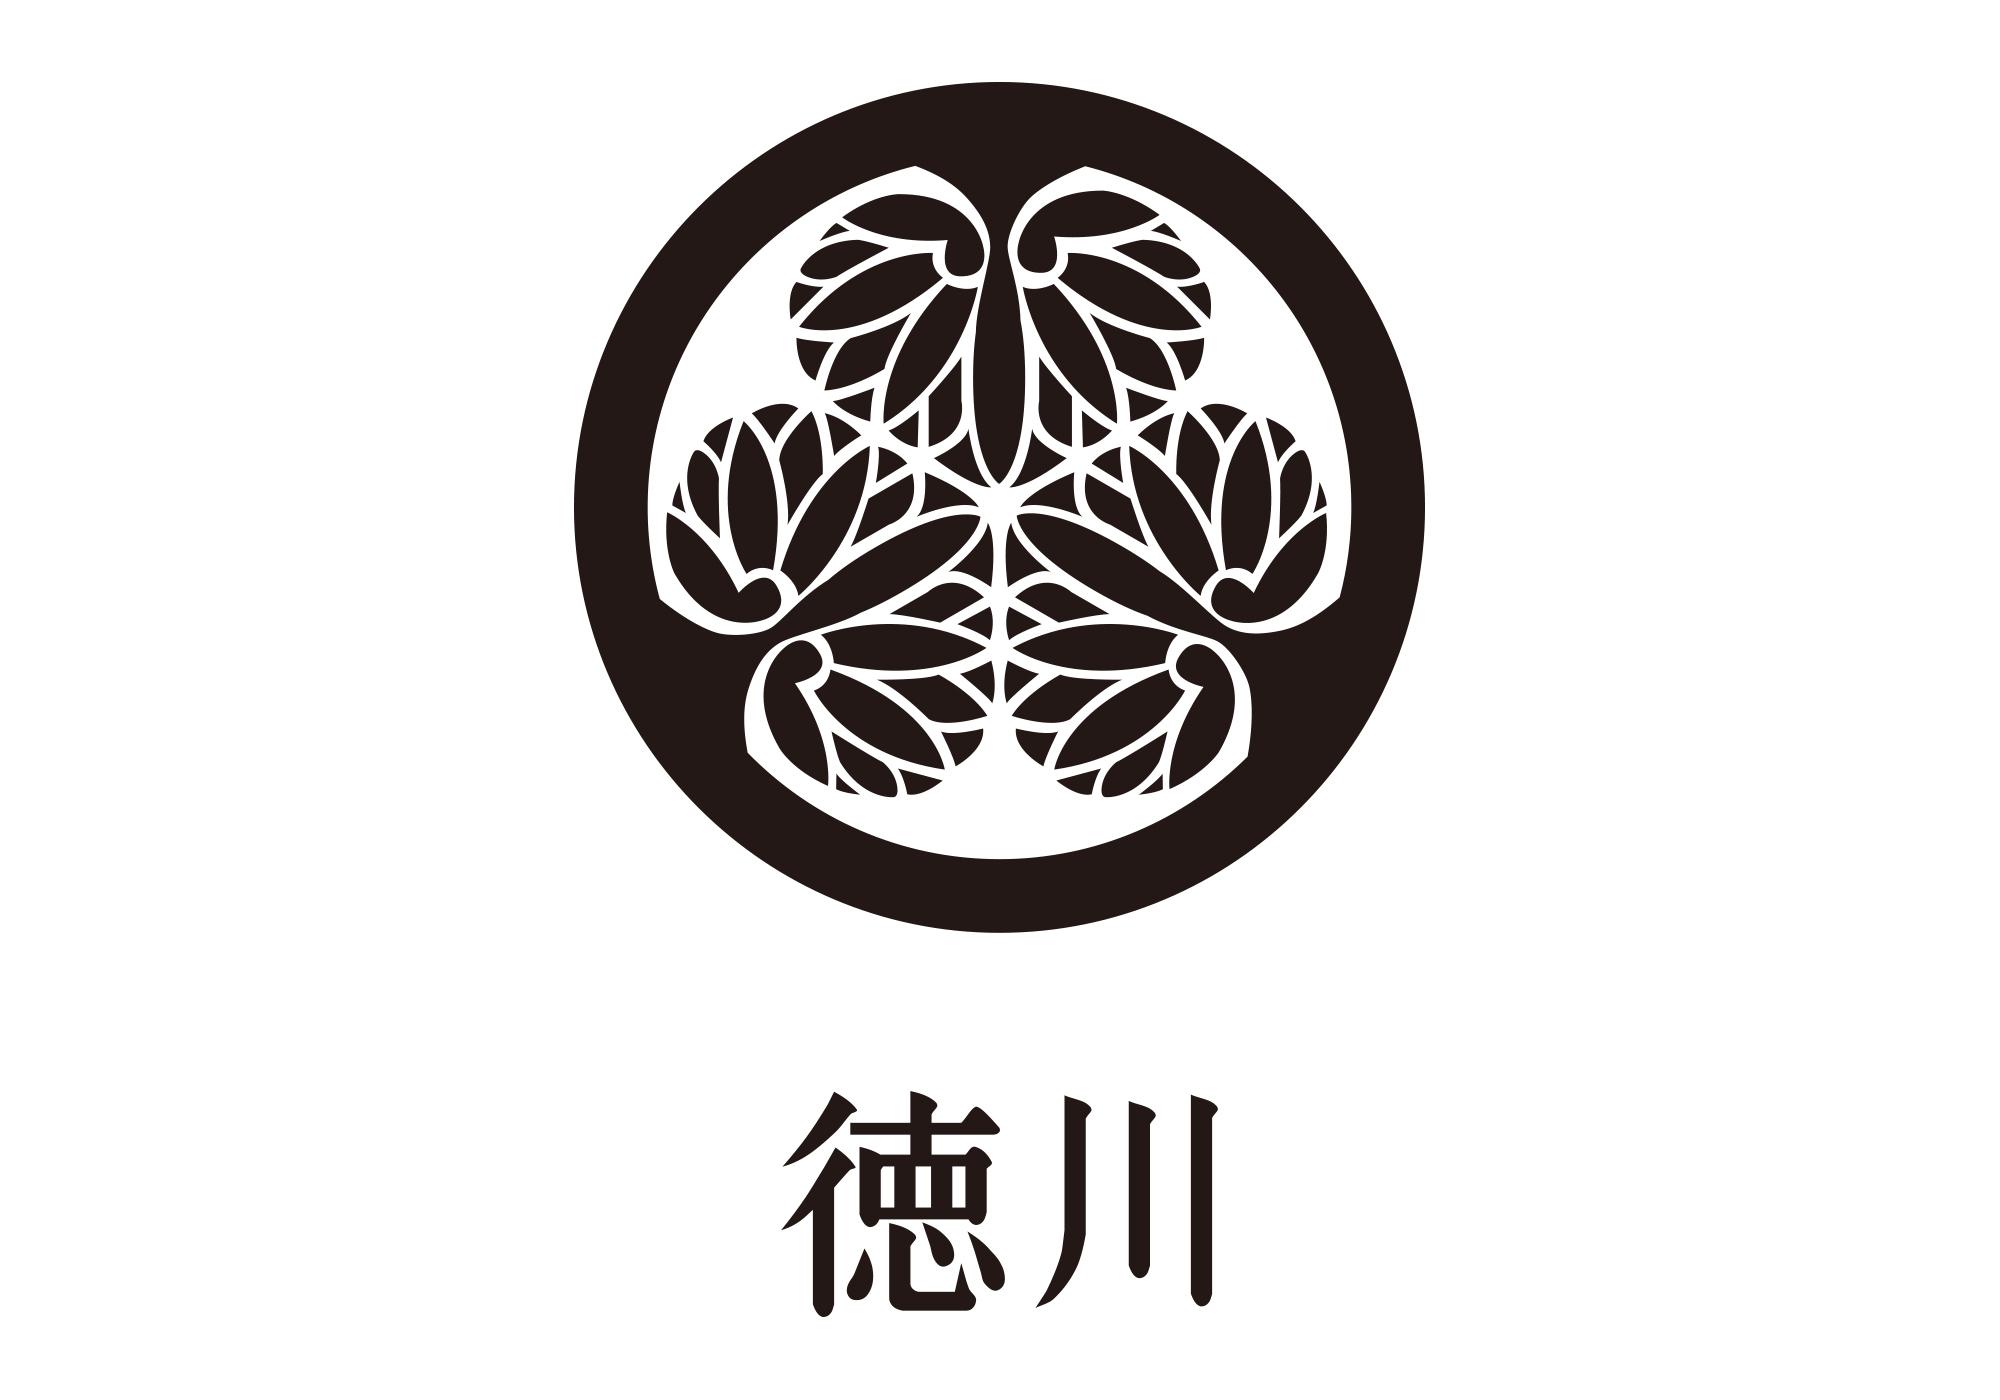 Japanese Family crest SHOGUN TOKUGAWA / 家紋 将軍 徳川